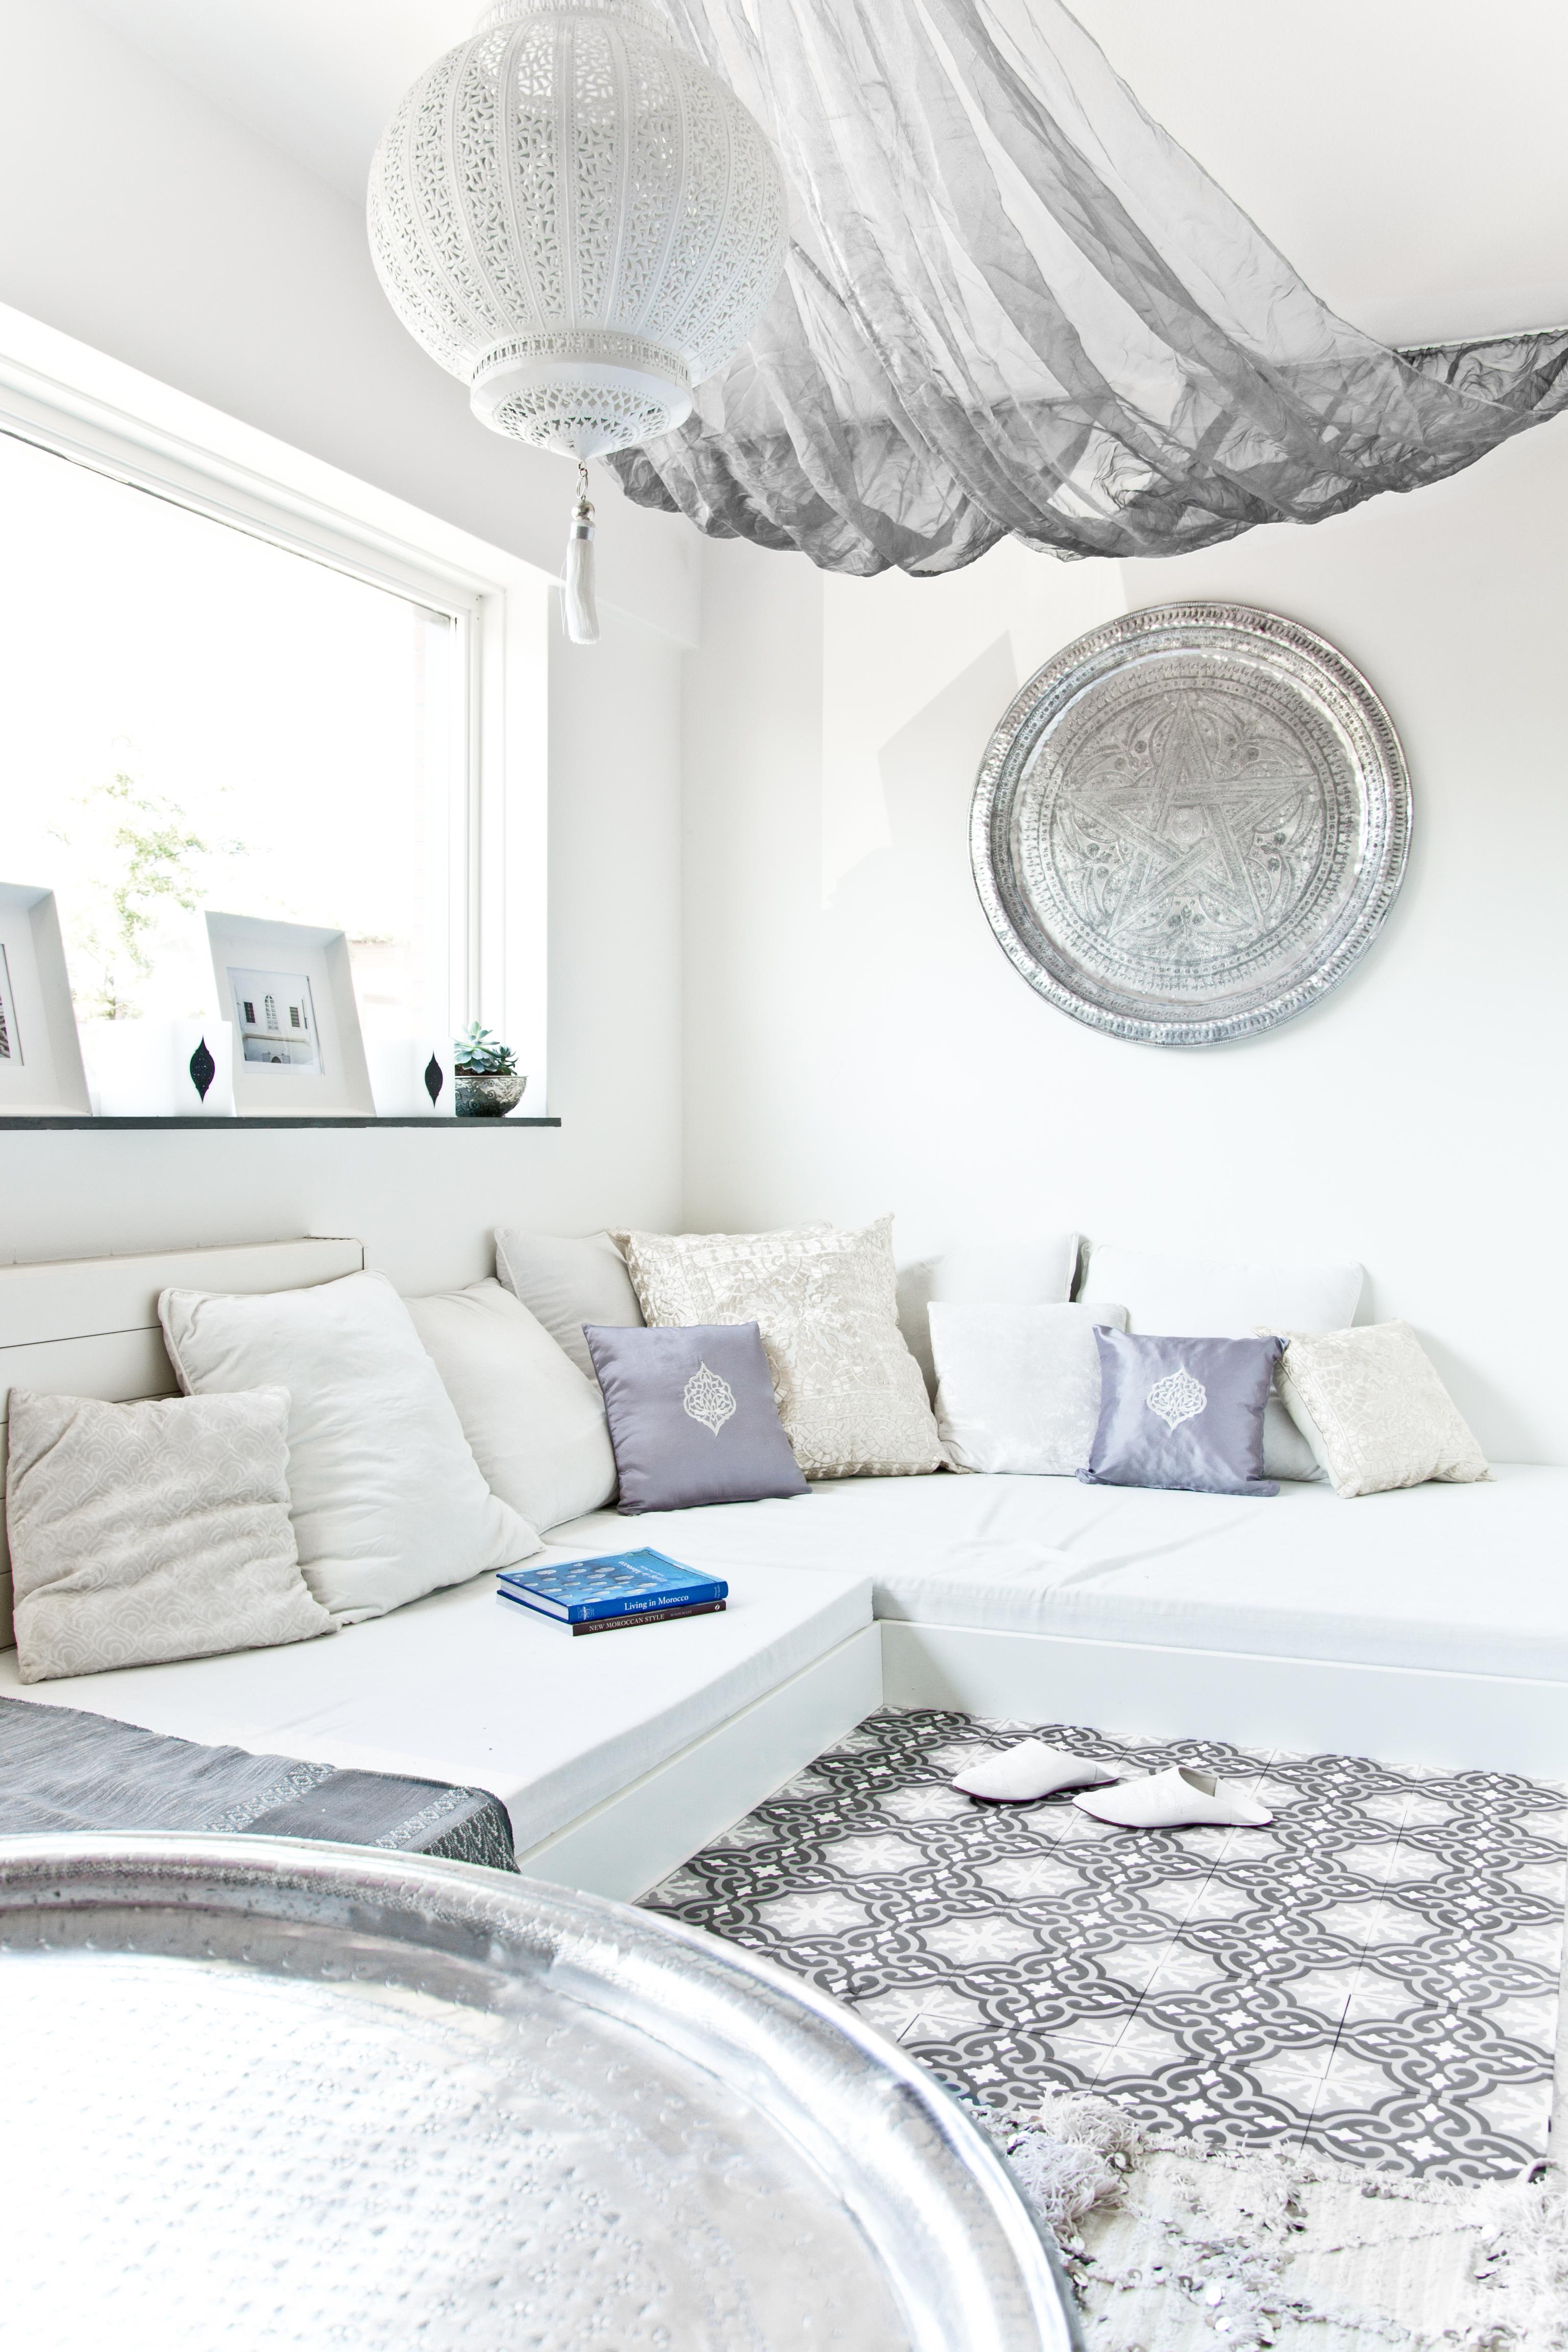 Marokkaanse dienbladen in huis